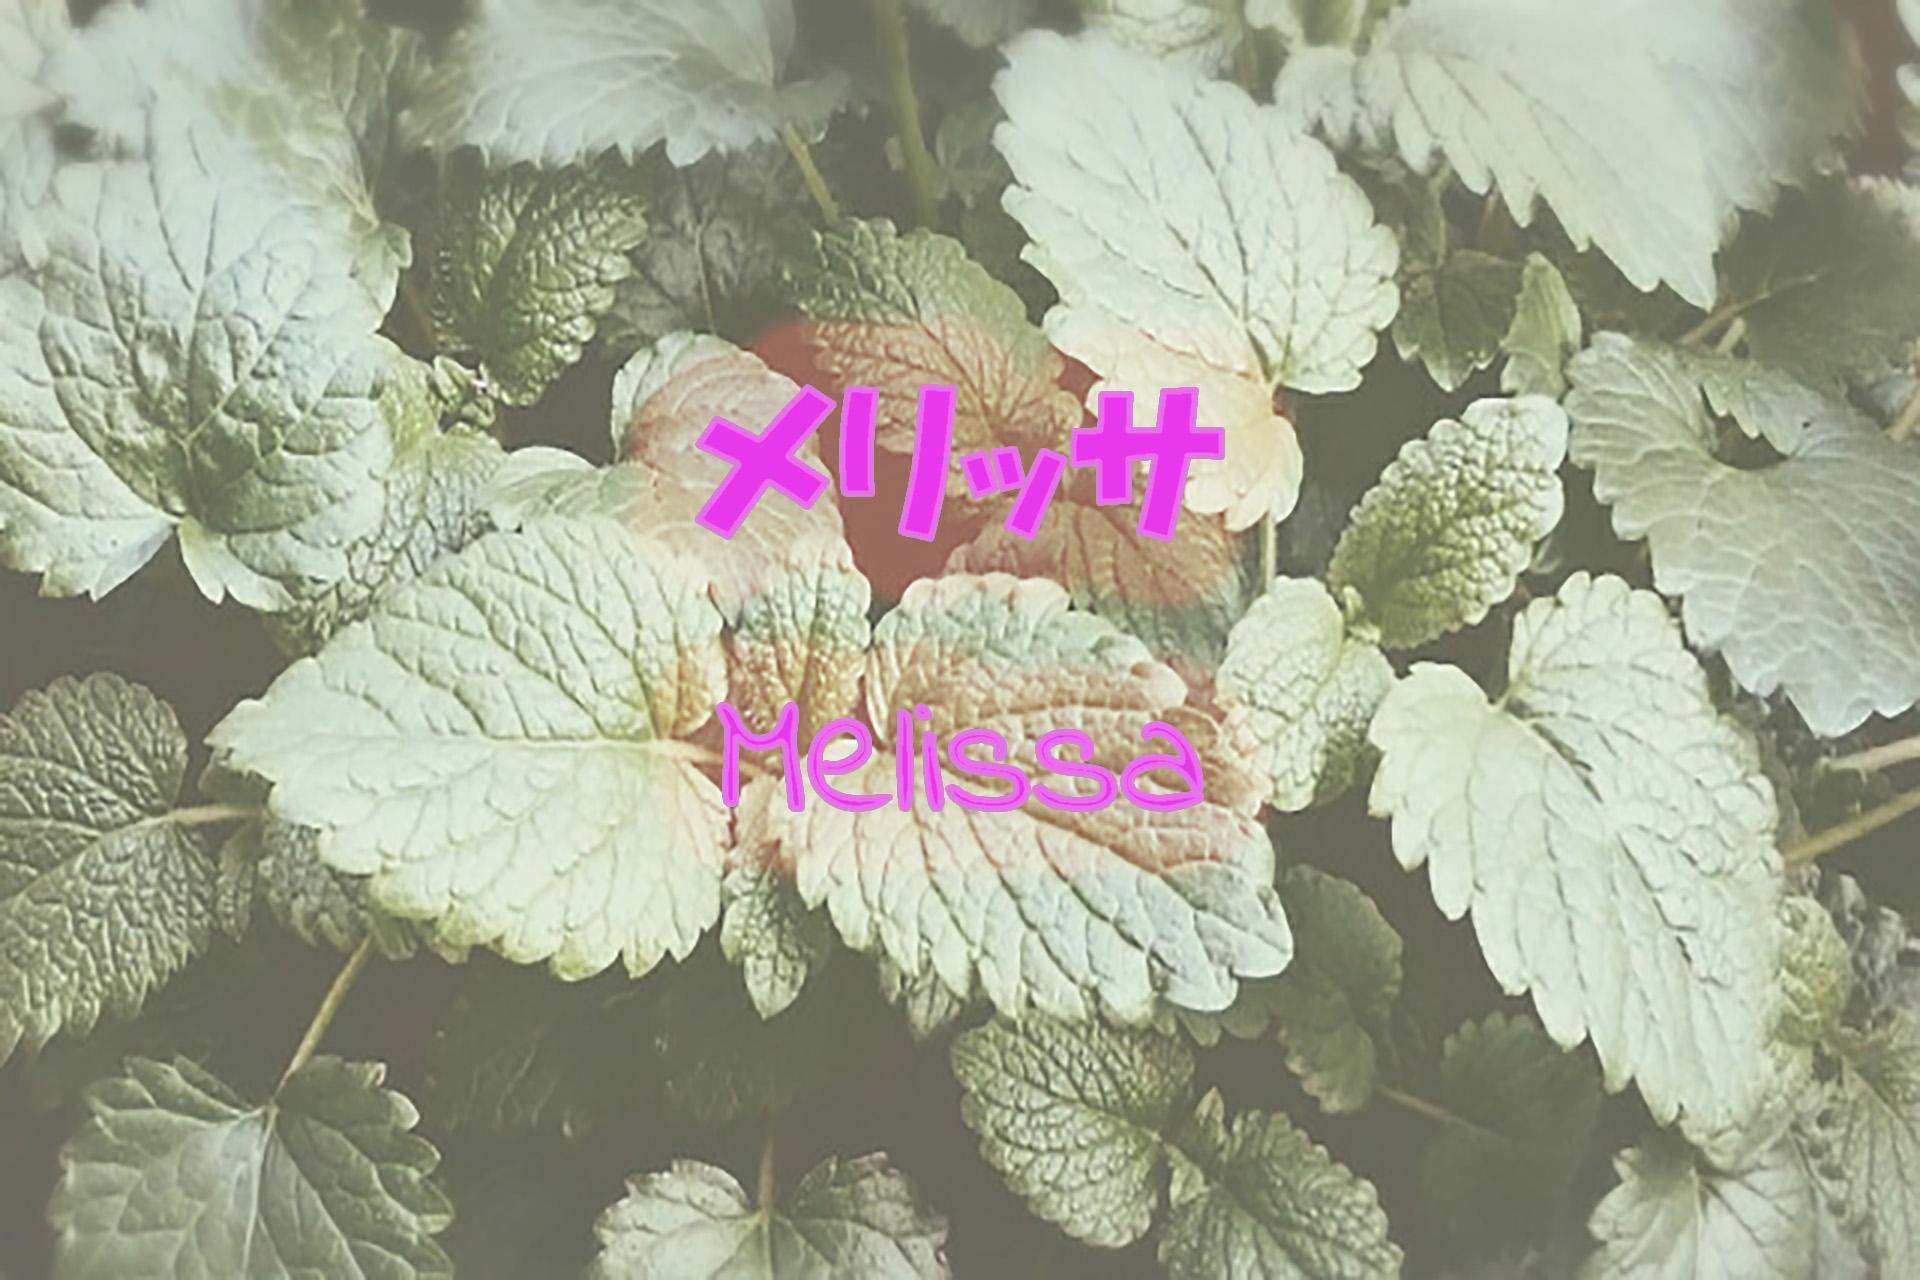 melissa_191117